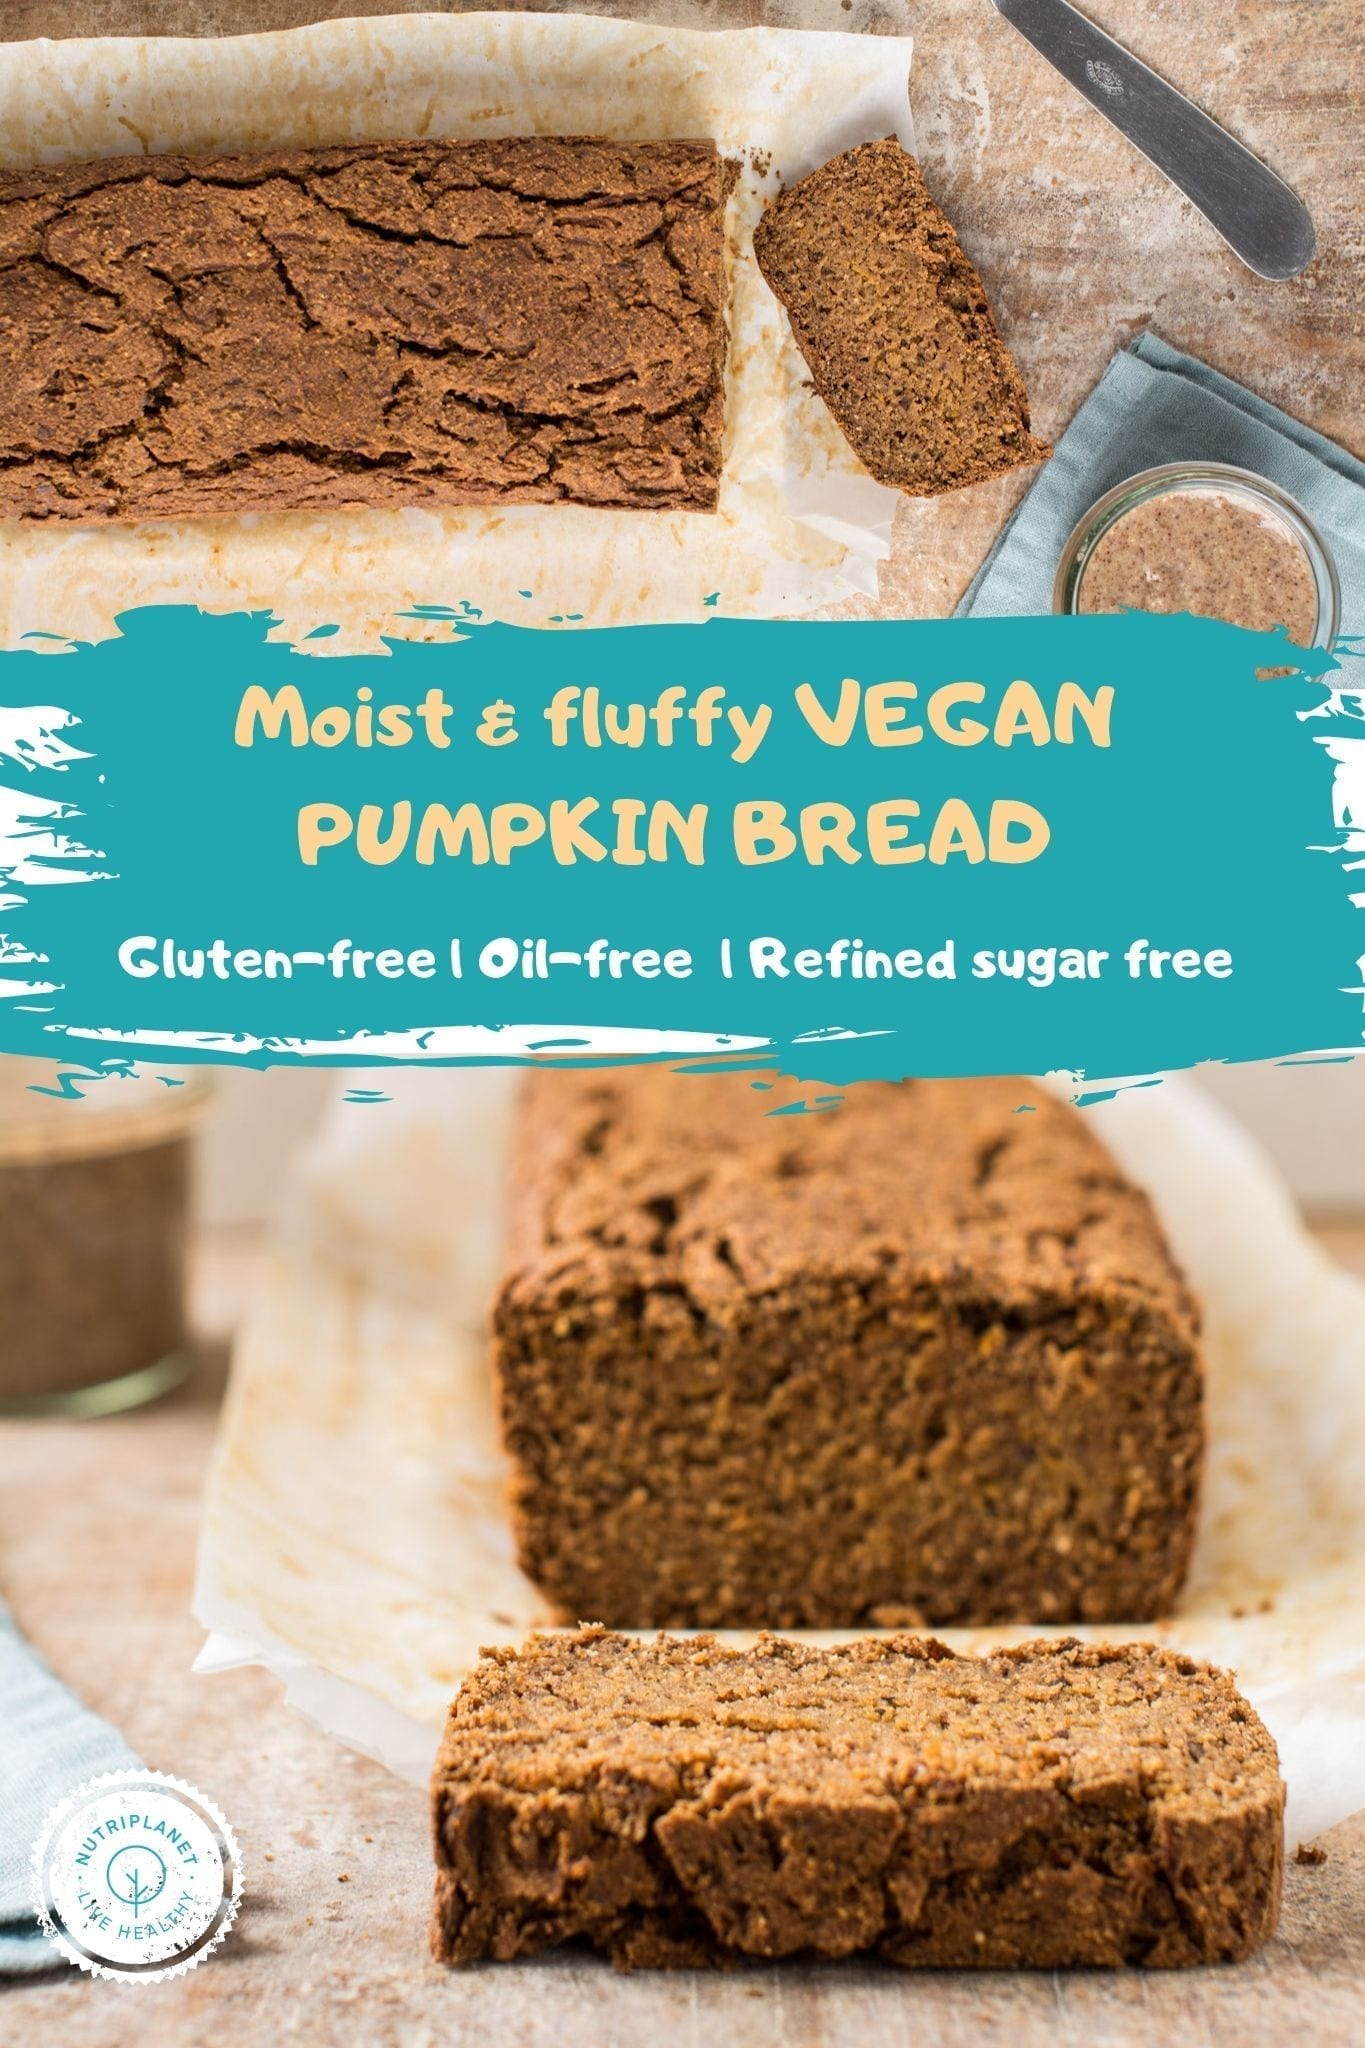 Perfectly moist vegan gluten-free pumpkin bread recipe that uses neither oils nor refined sugar.